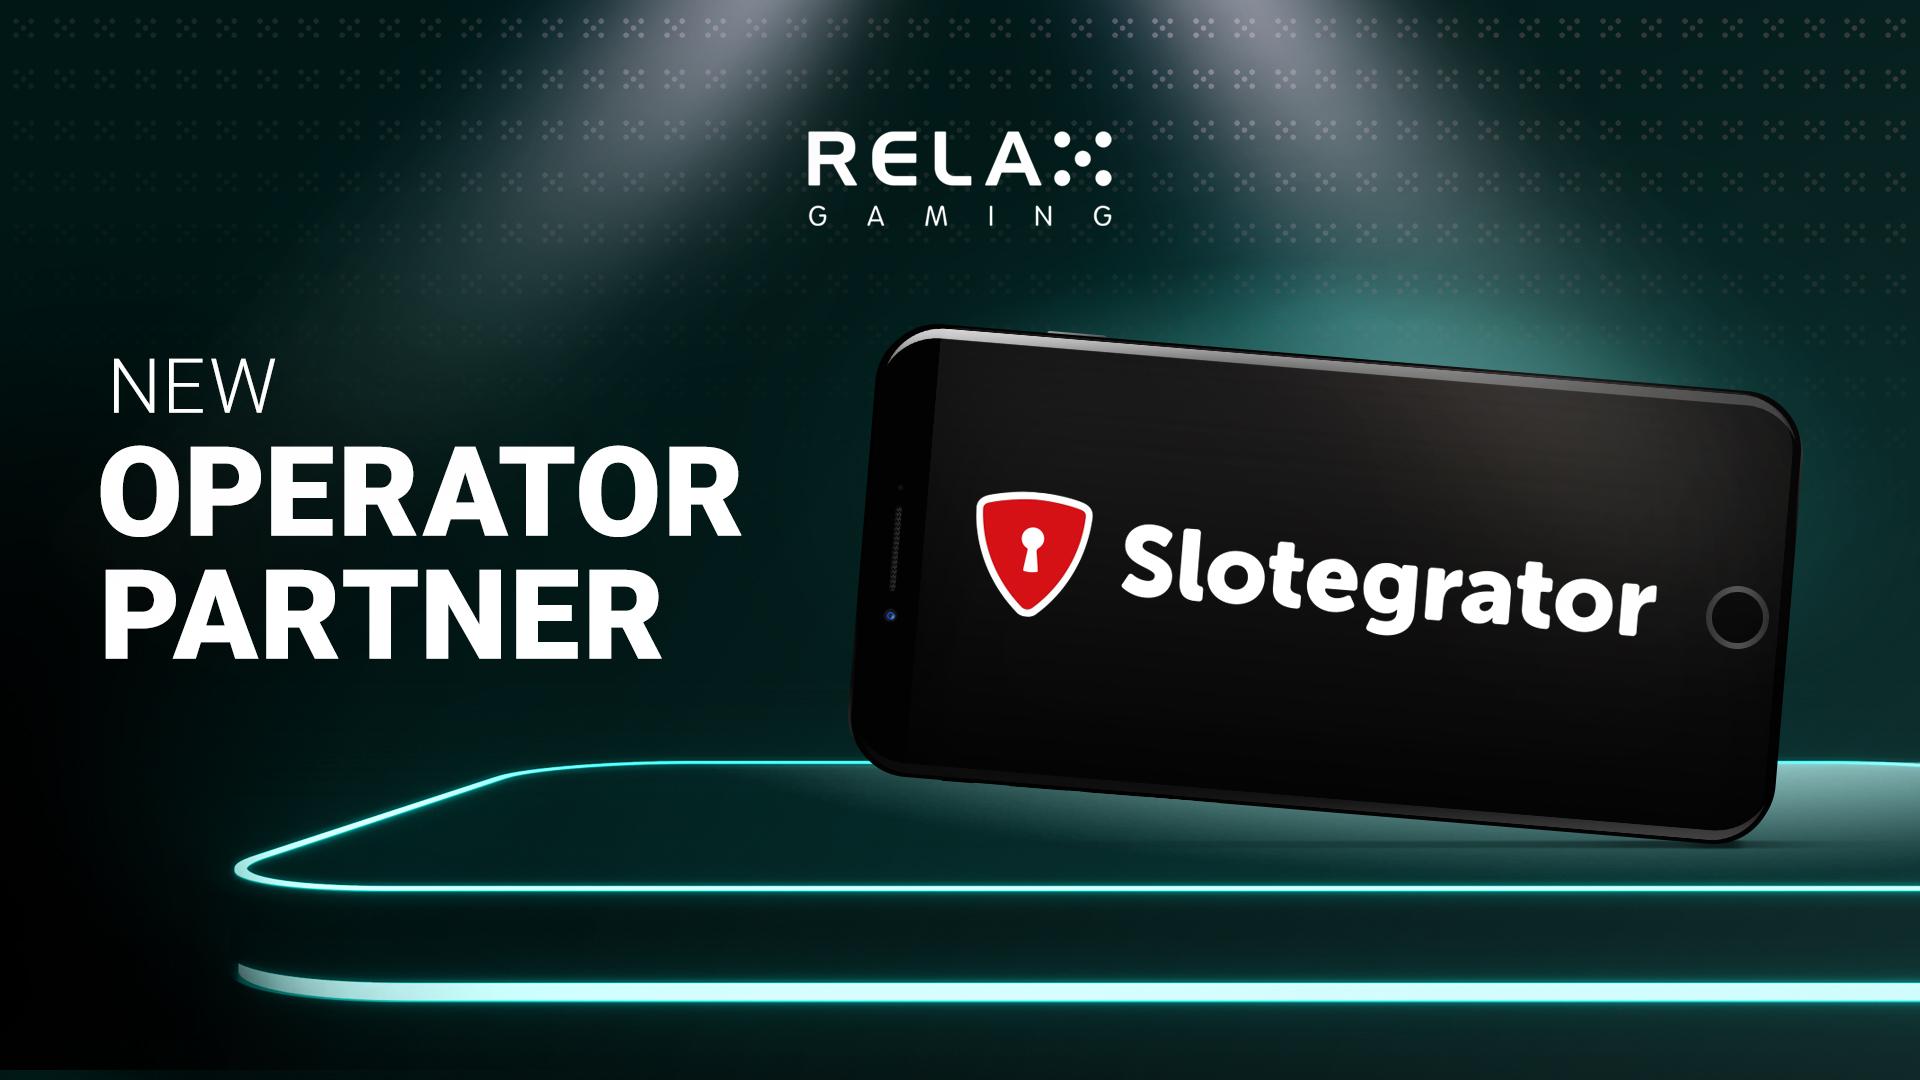 Slotegrator integrates Relax Gaming's award-winning games